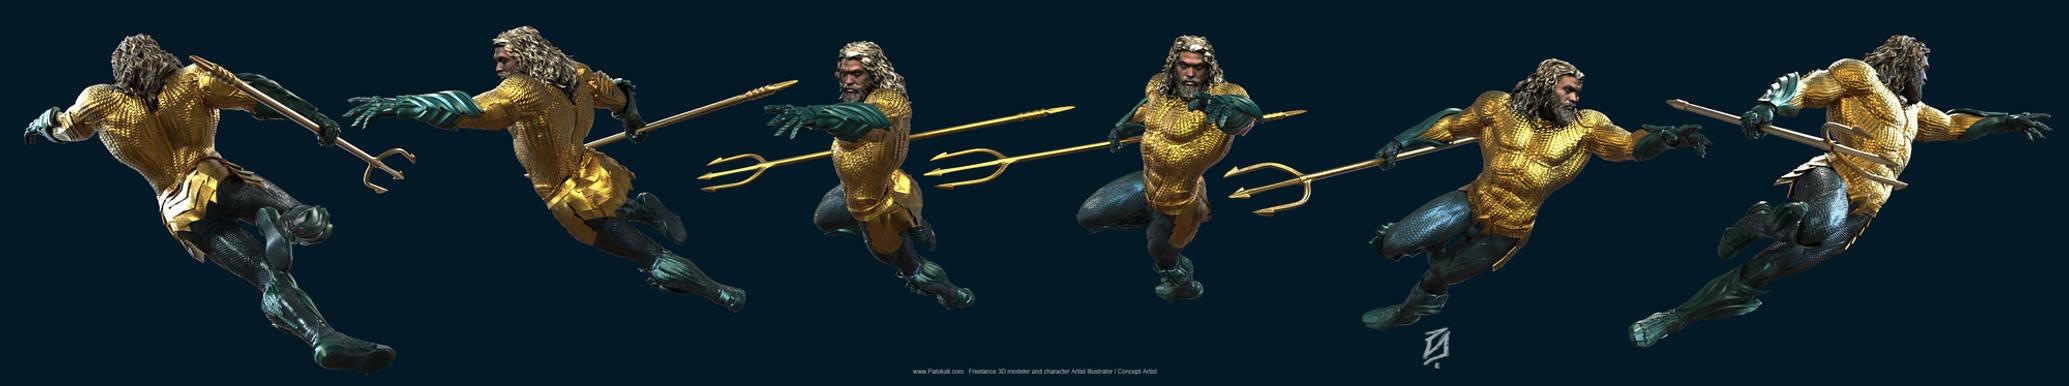 01-Aquaman-Pose2KS